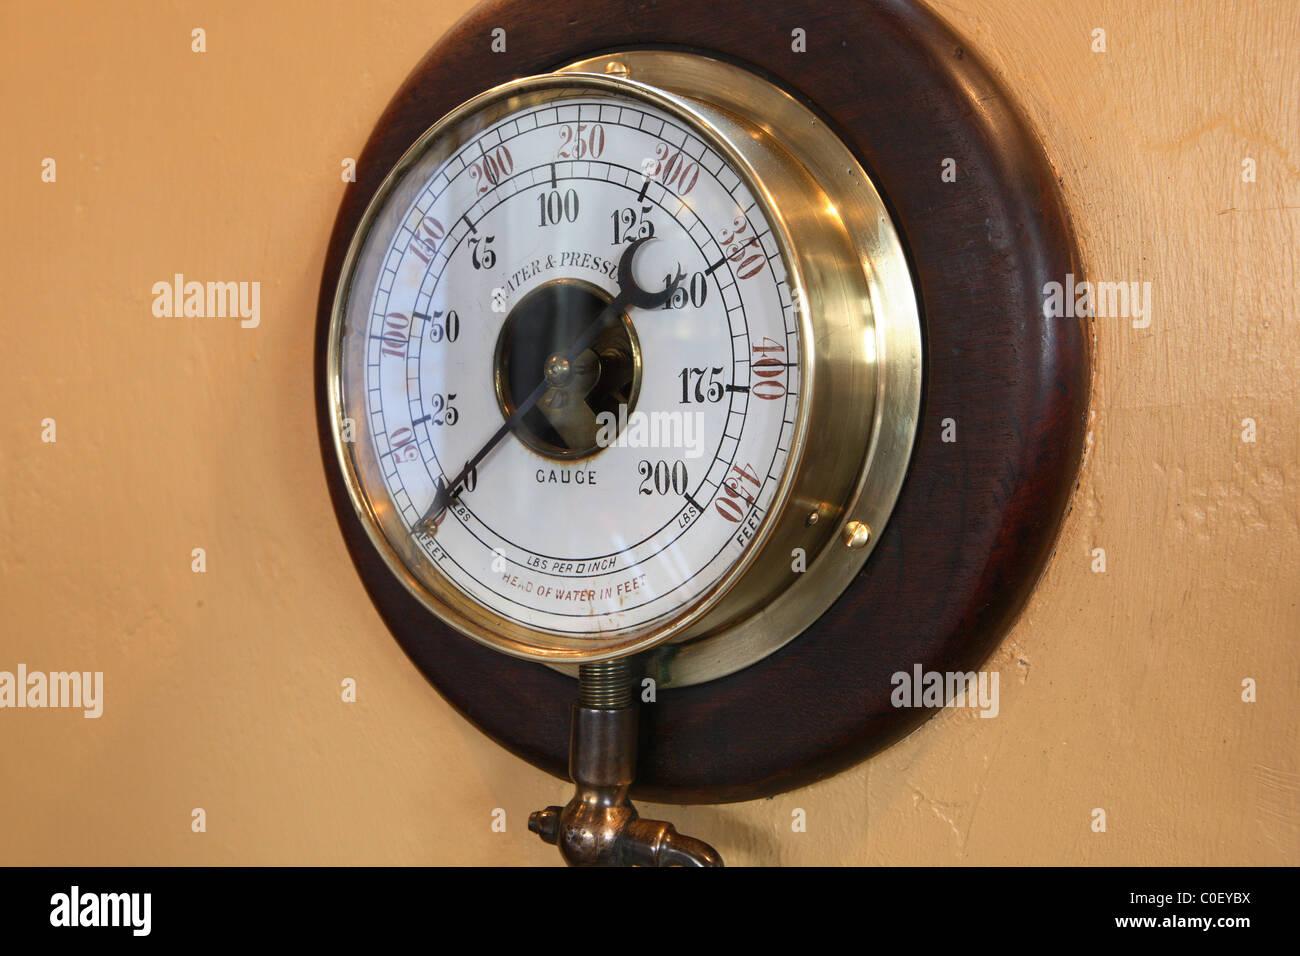 Water Pressure Gauge - Stock Image